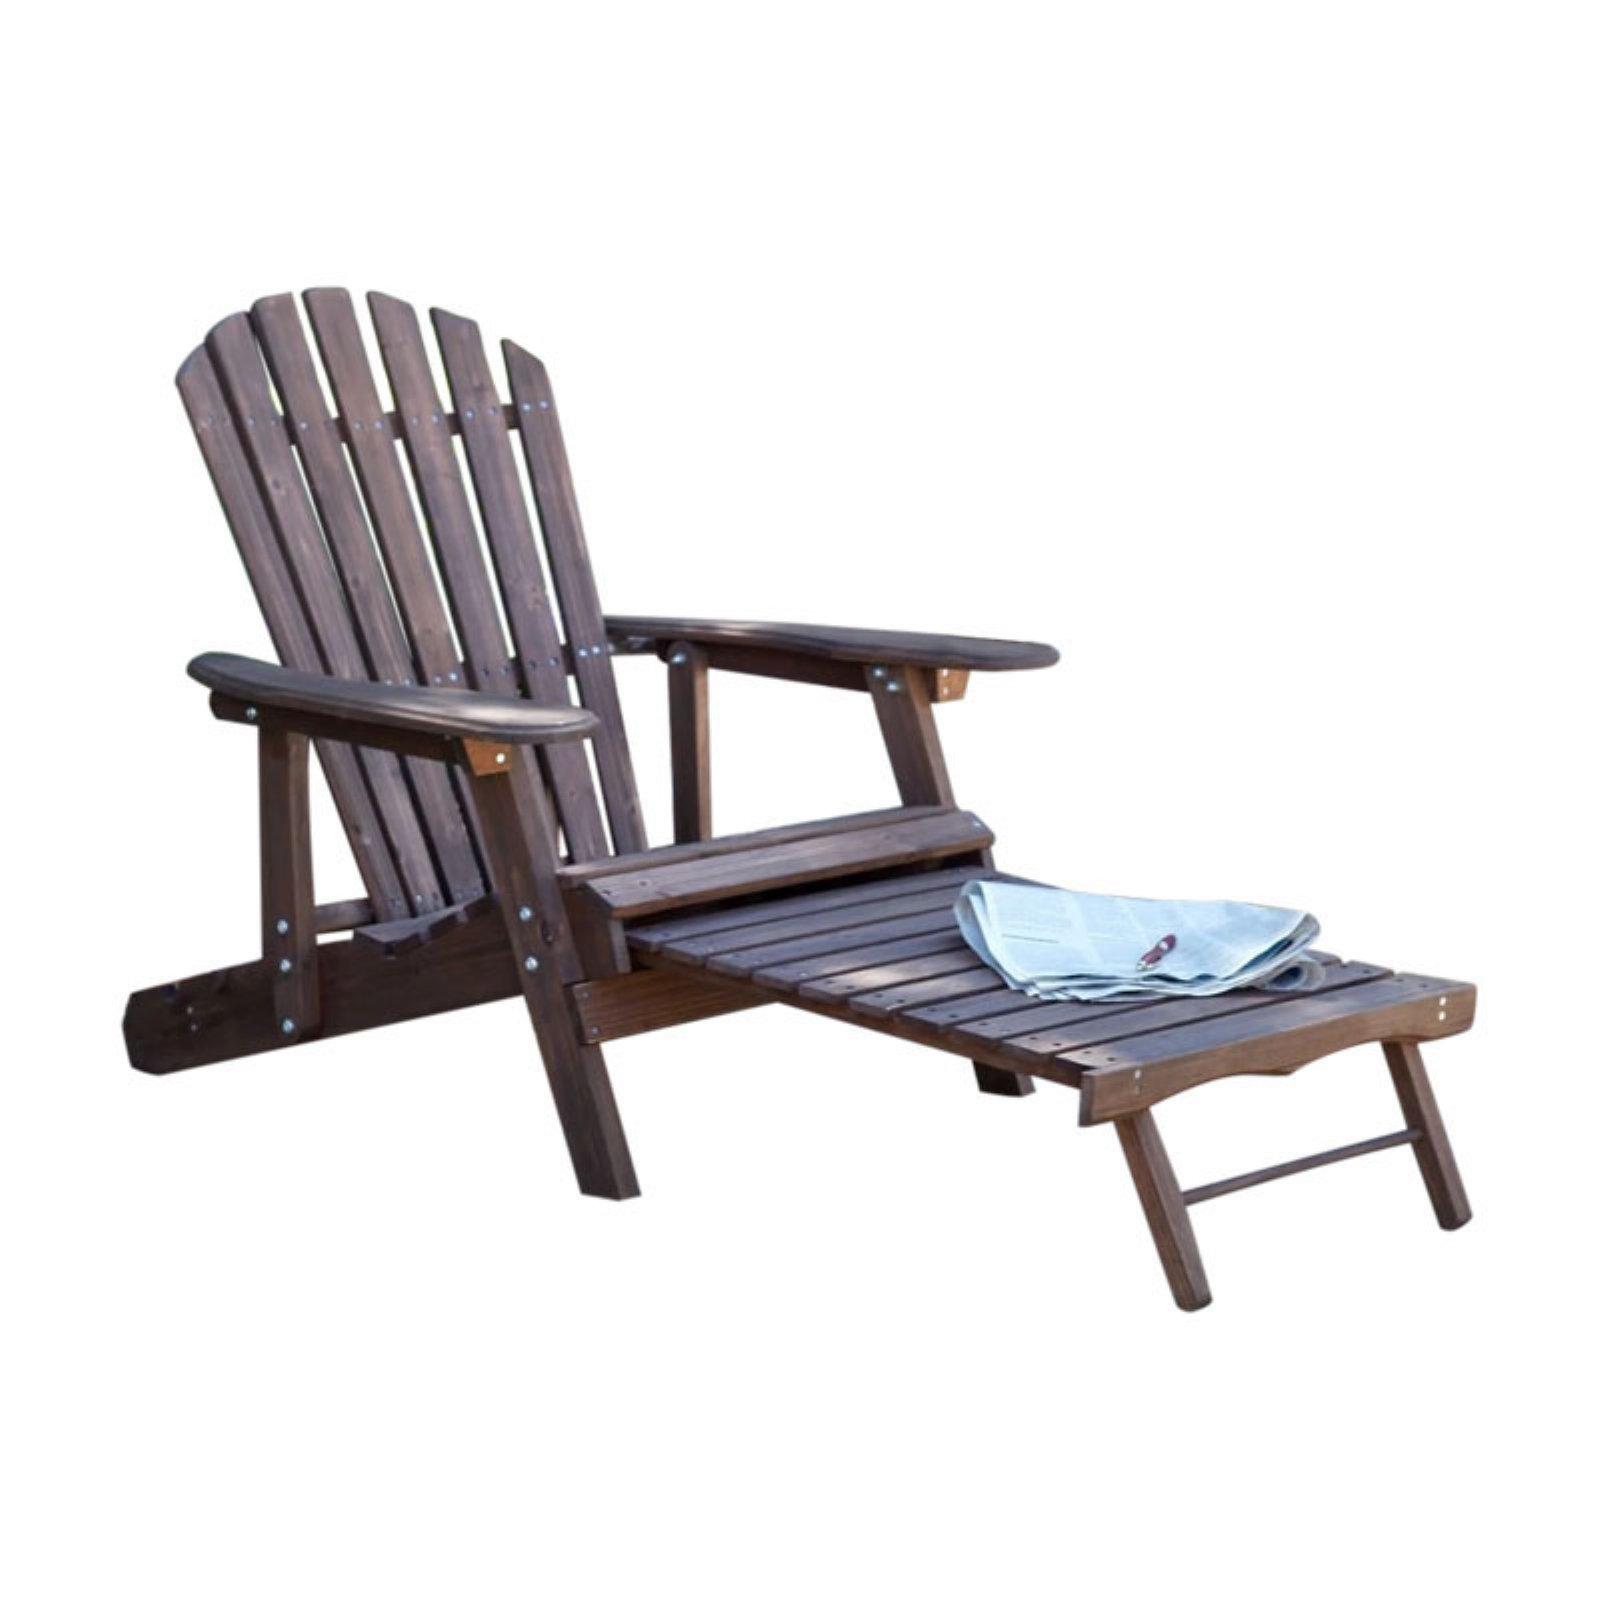 Outdoor W Unlimited Muskoka Adjustable Reclining Adirondack Chair